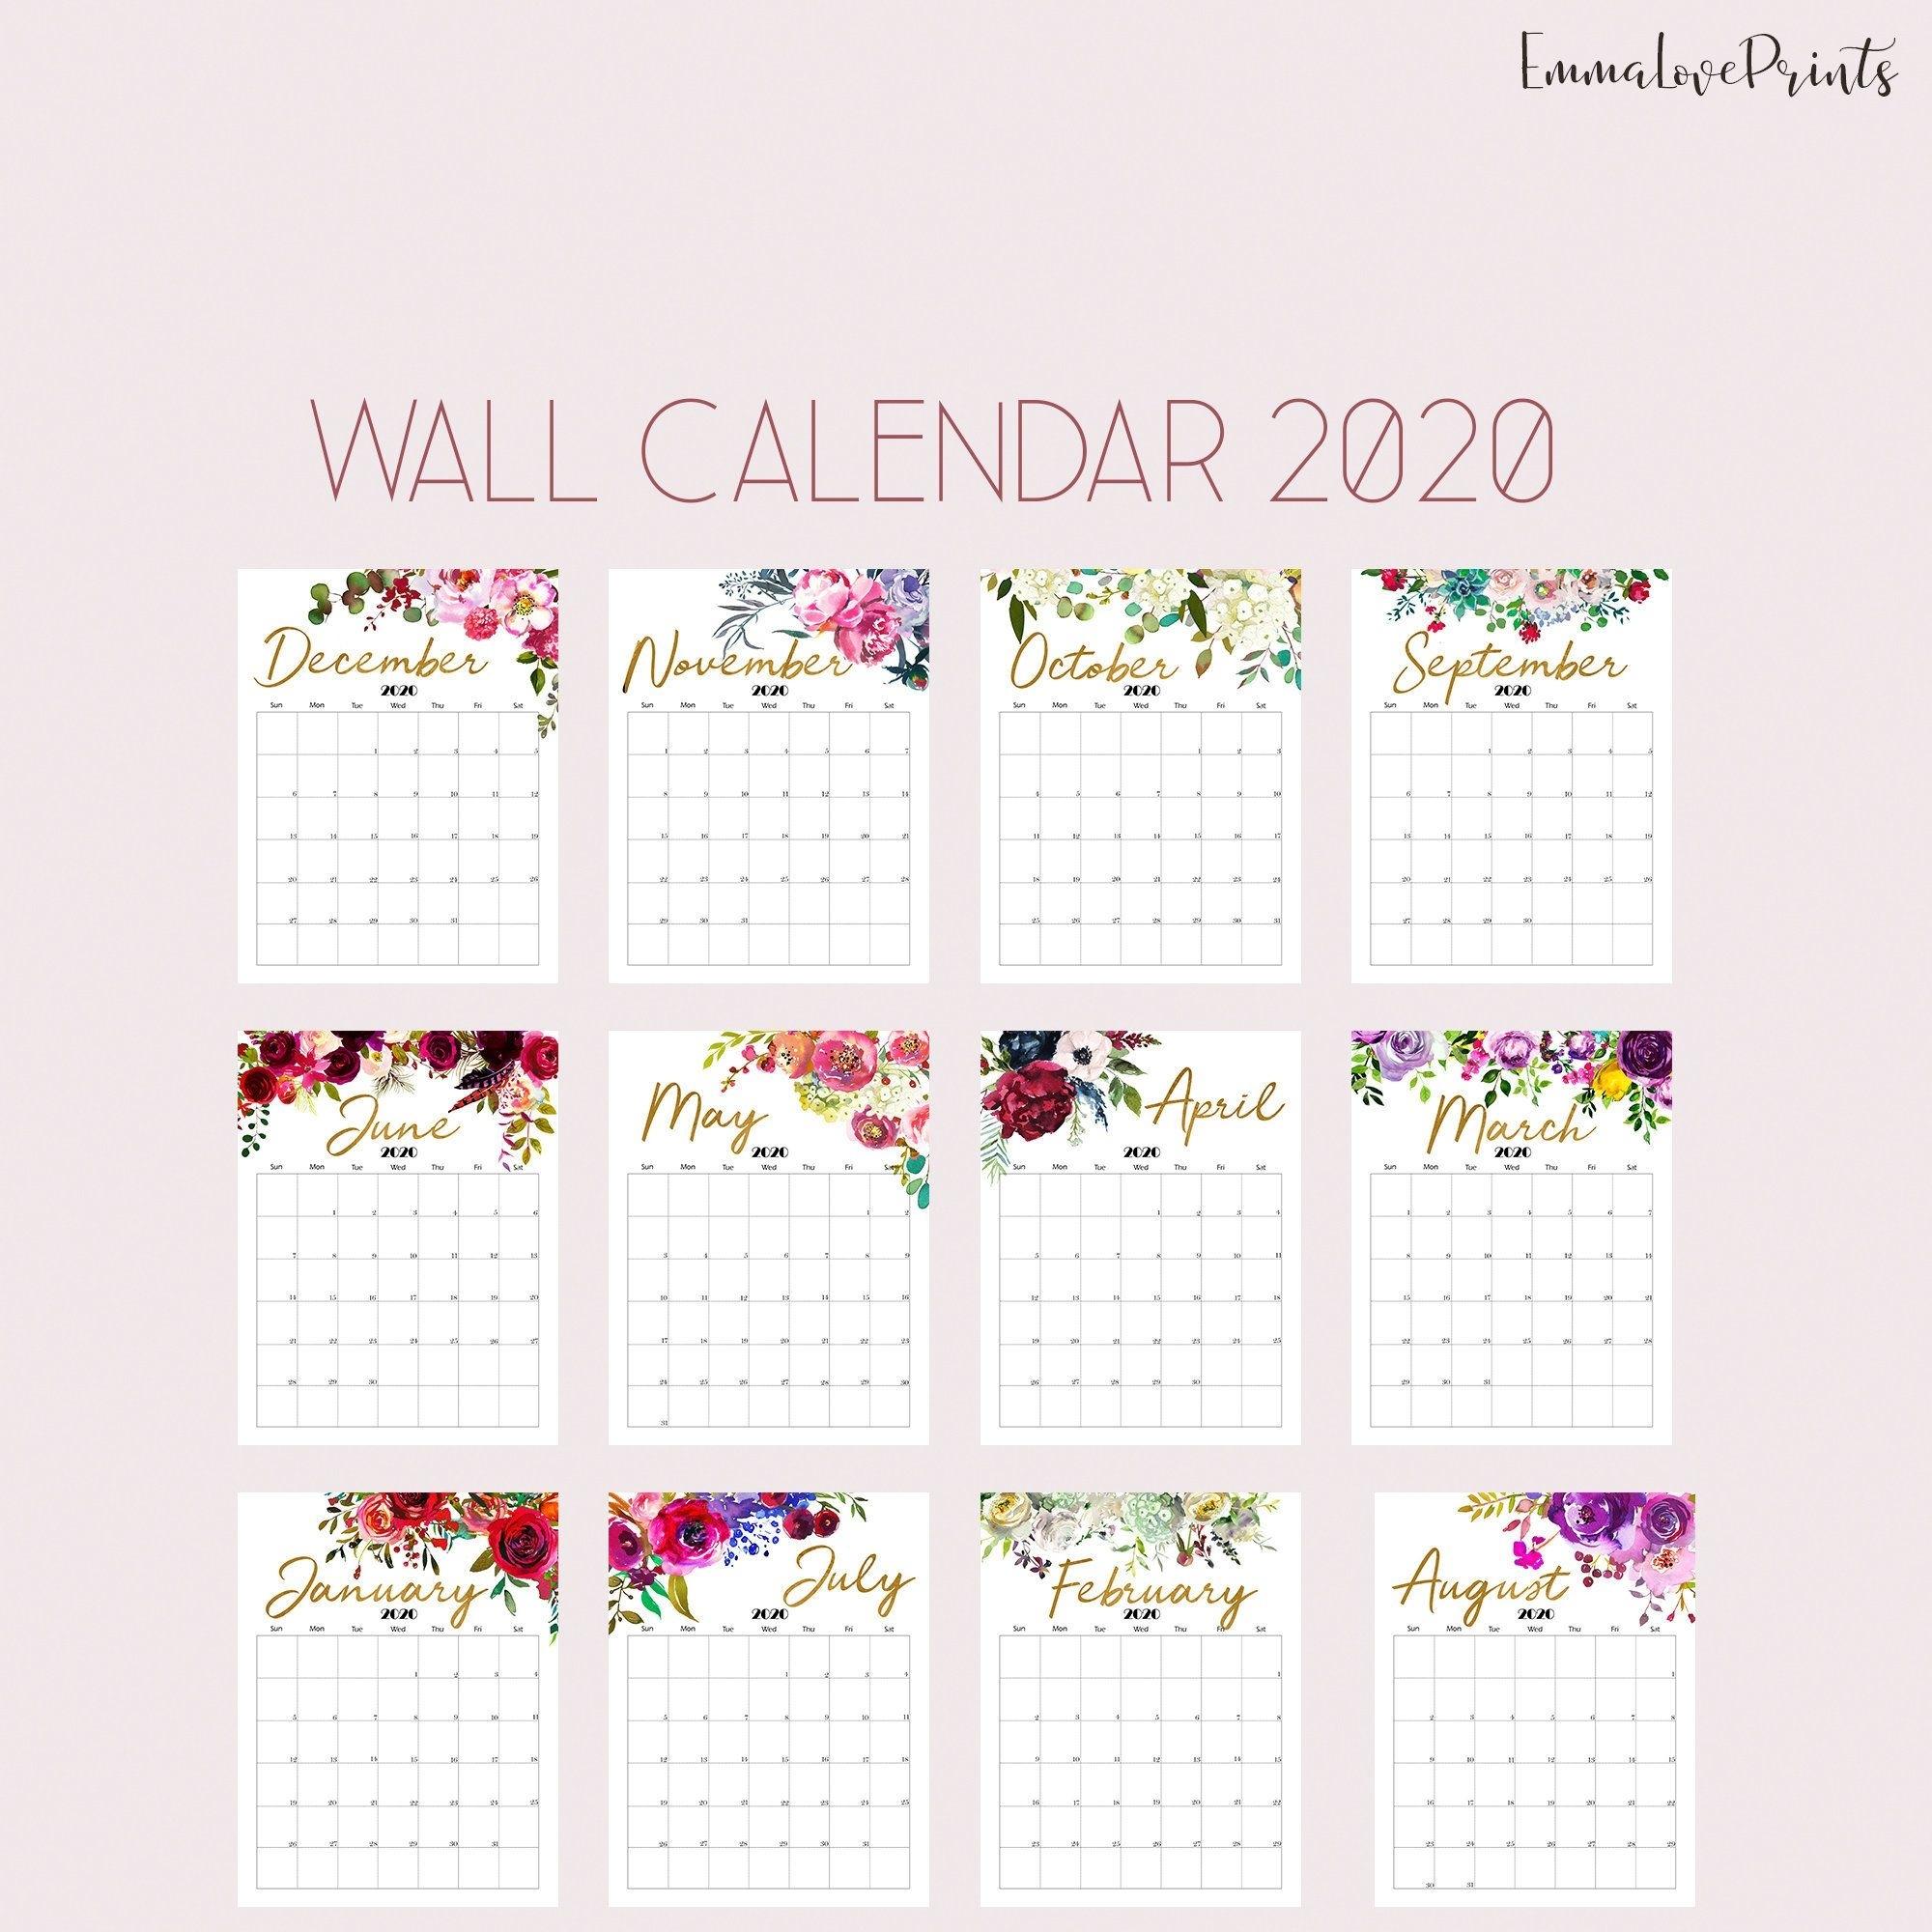 Printable Calendar 2020 Wall Calendar 2020 Desk Calendar, Floral pertaining to Calendar 365 2020 Printable